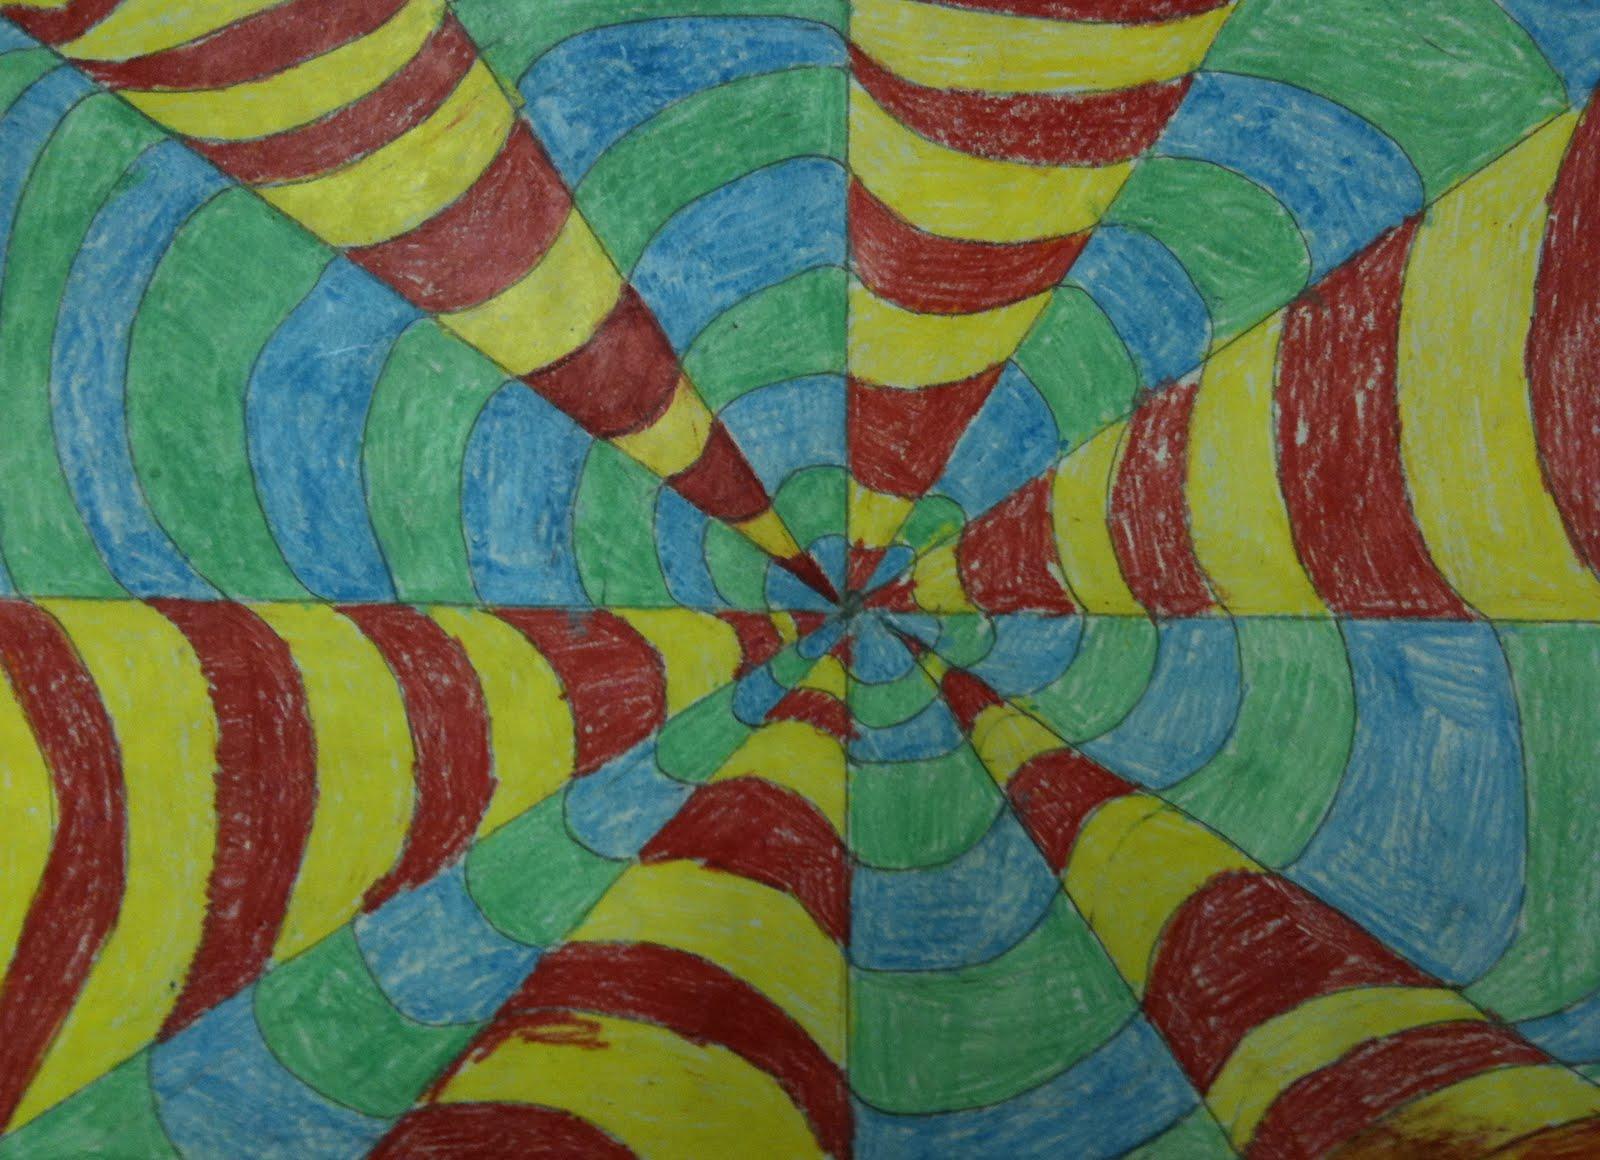 Art room blog 3rd grade pop art project for Crafts for 3rd graders